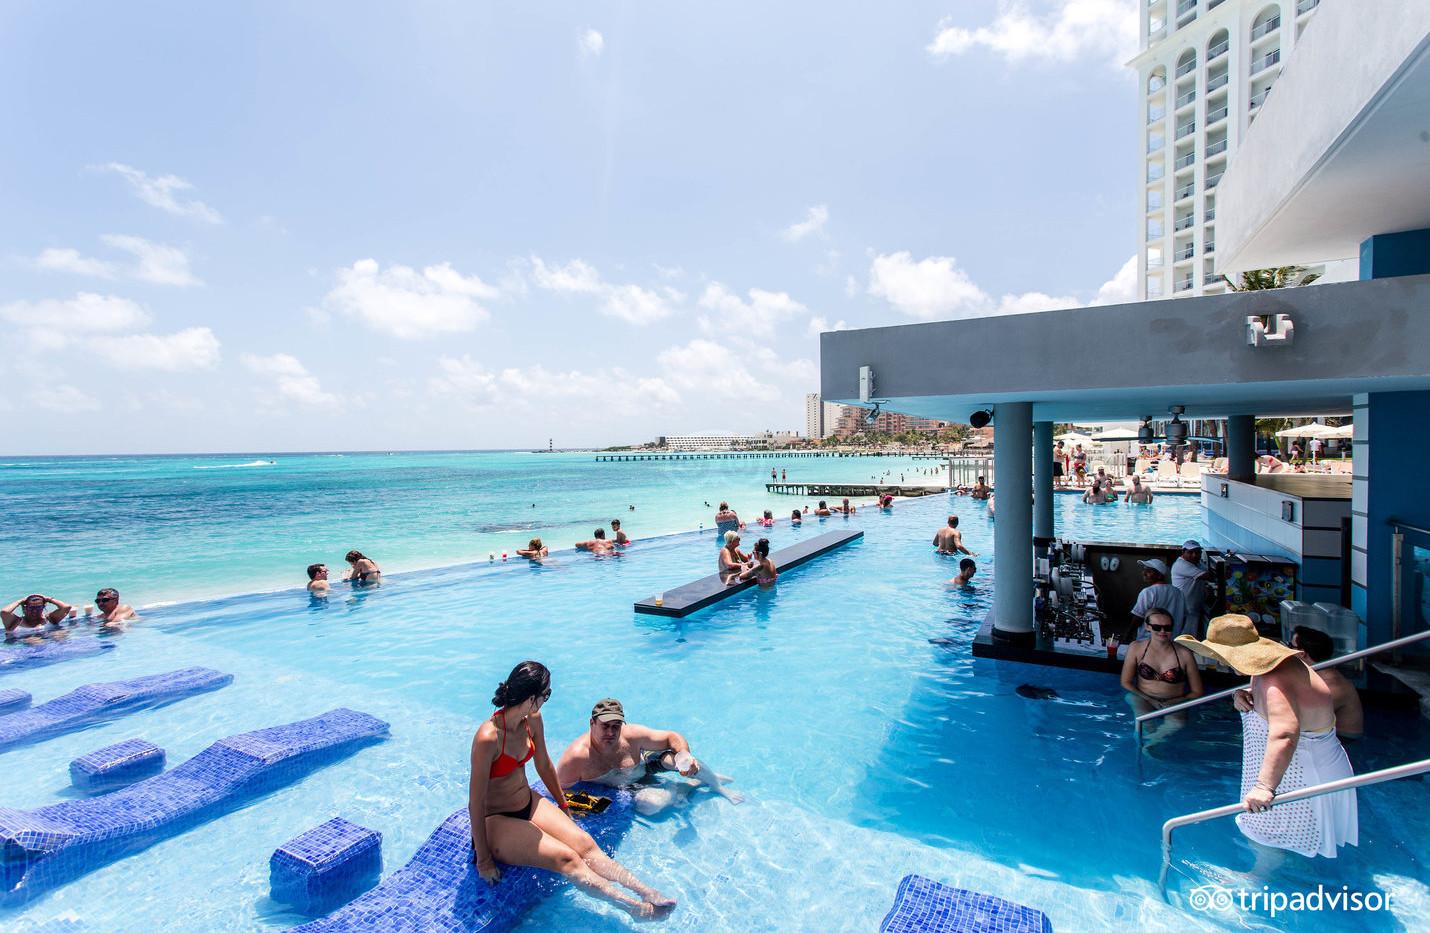 wetn-drinking-pool--v12371221.jpg